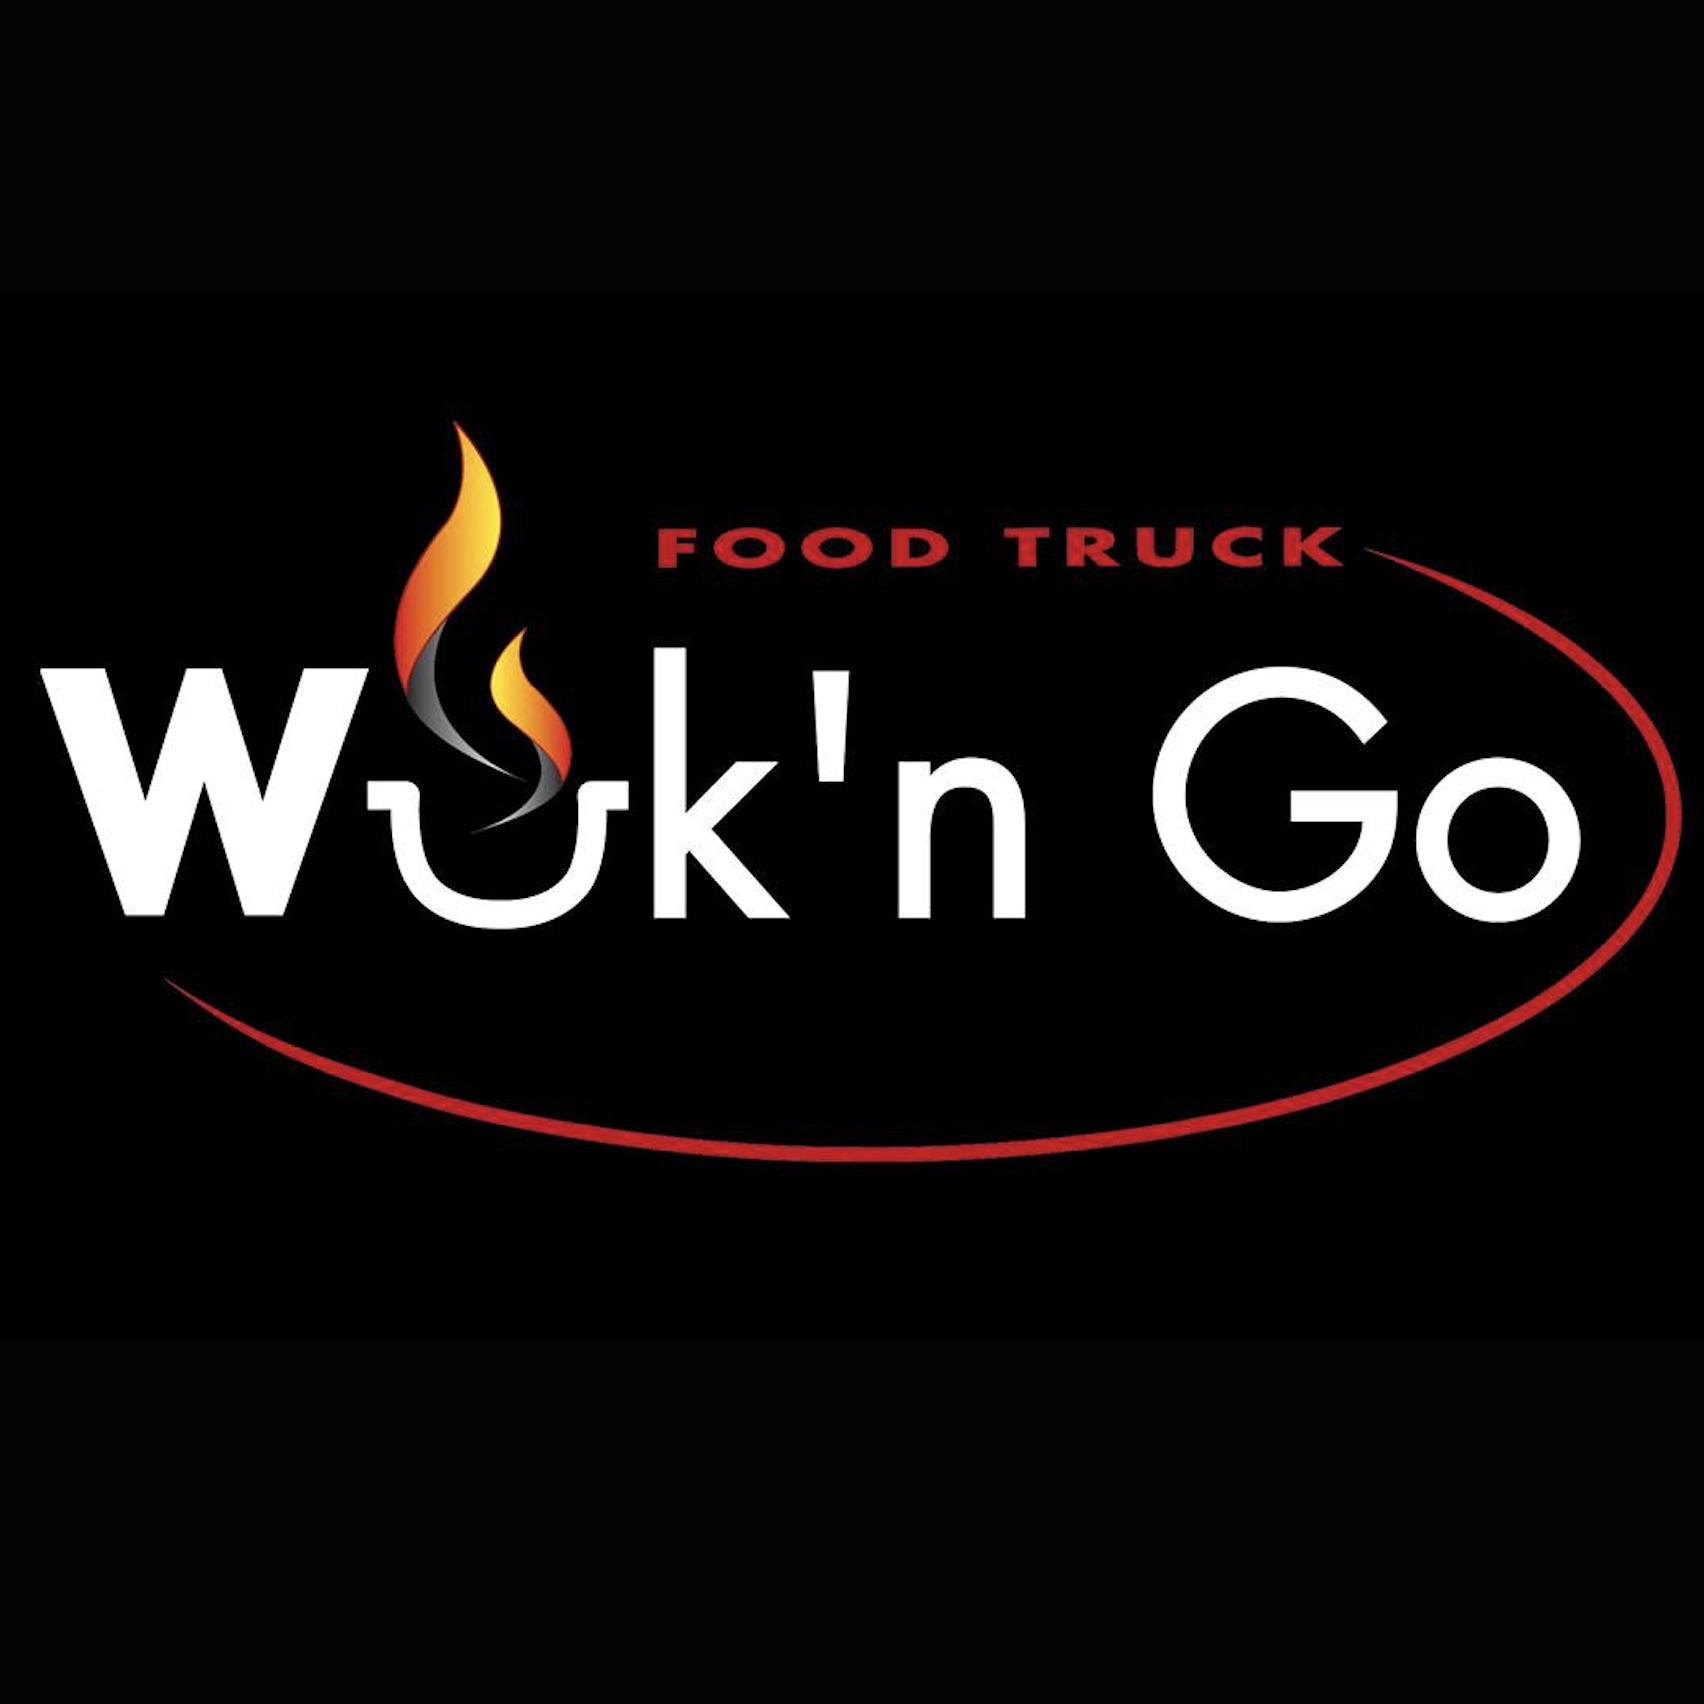 food truck Wok'n Go